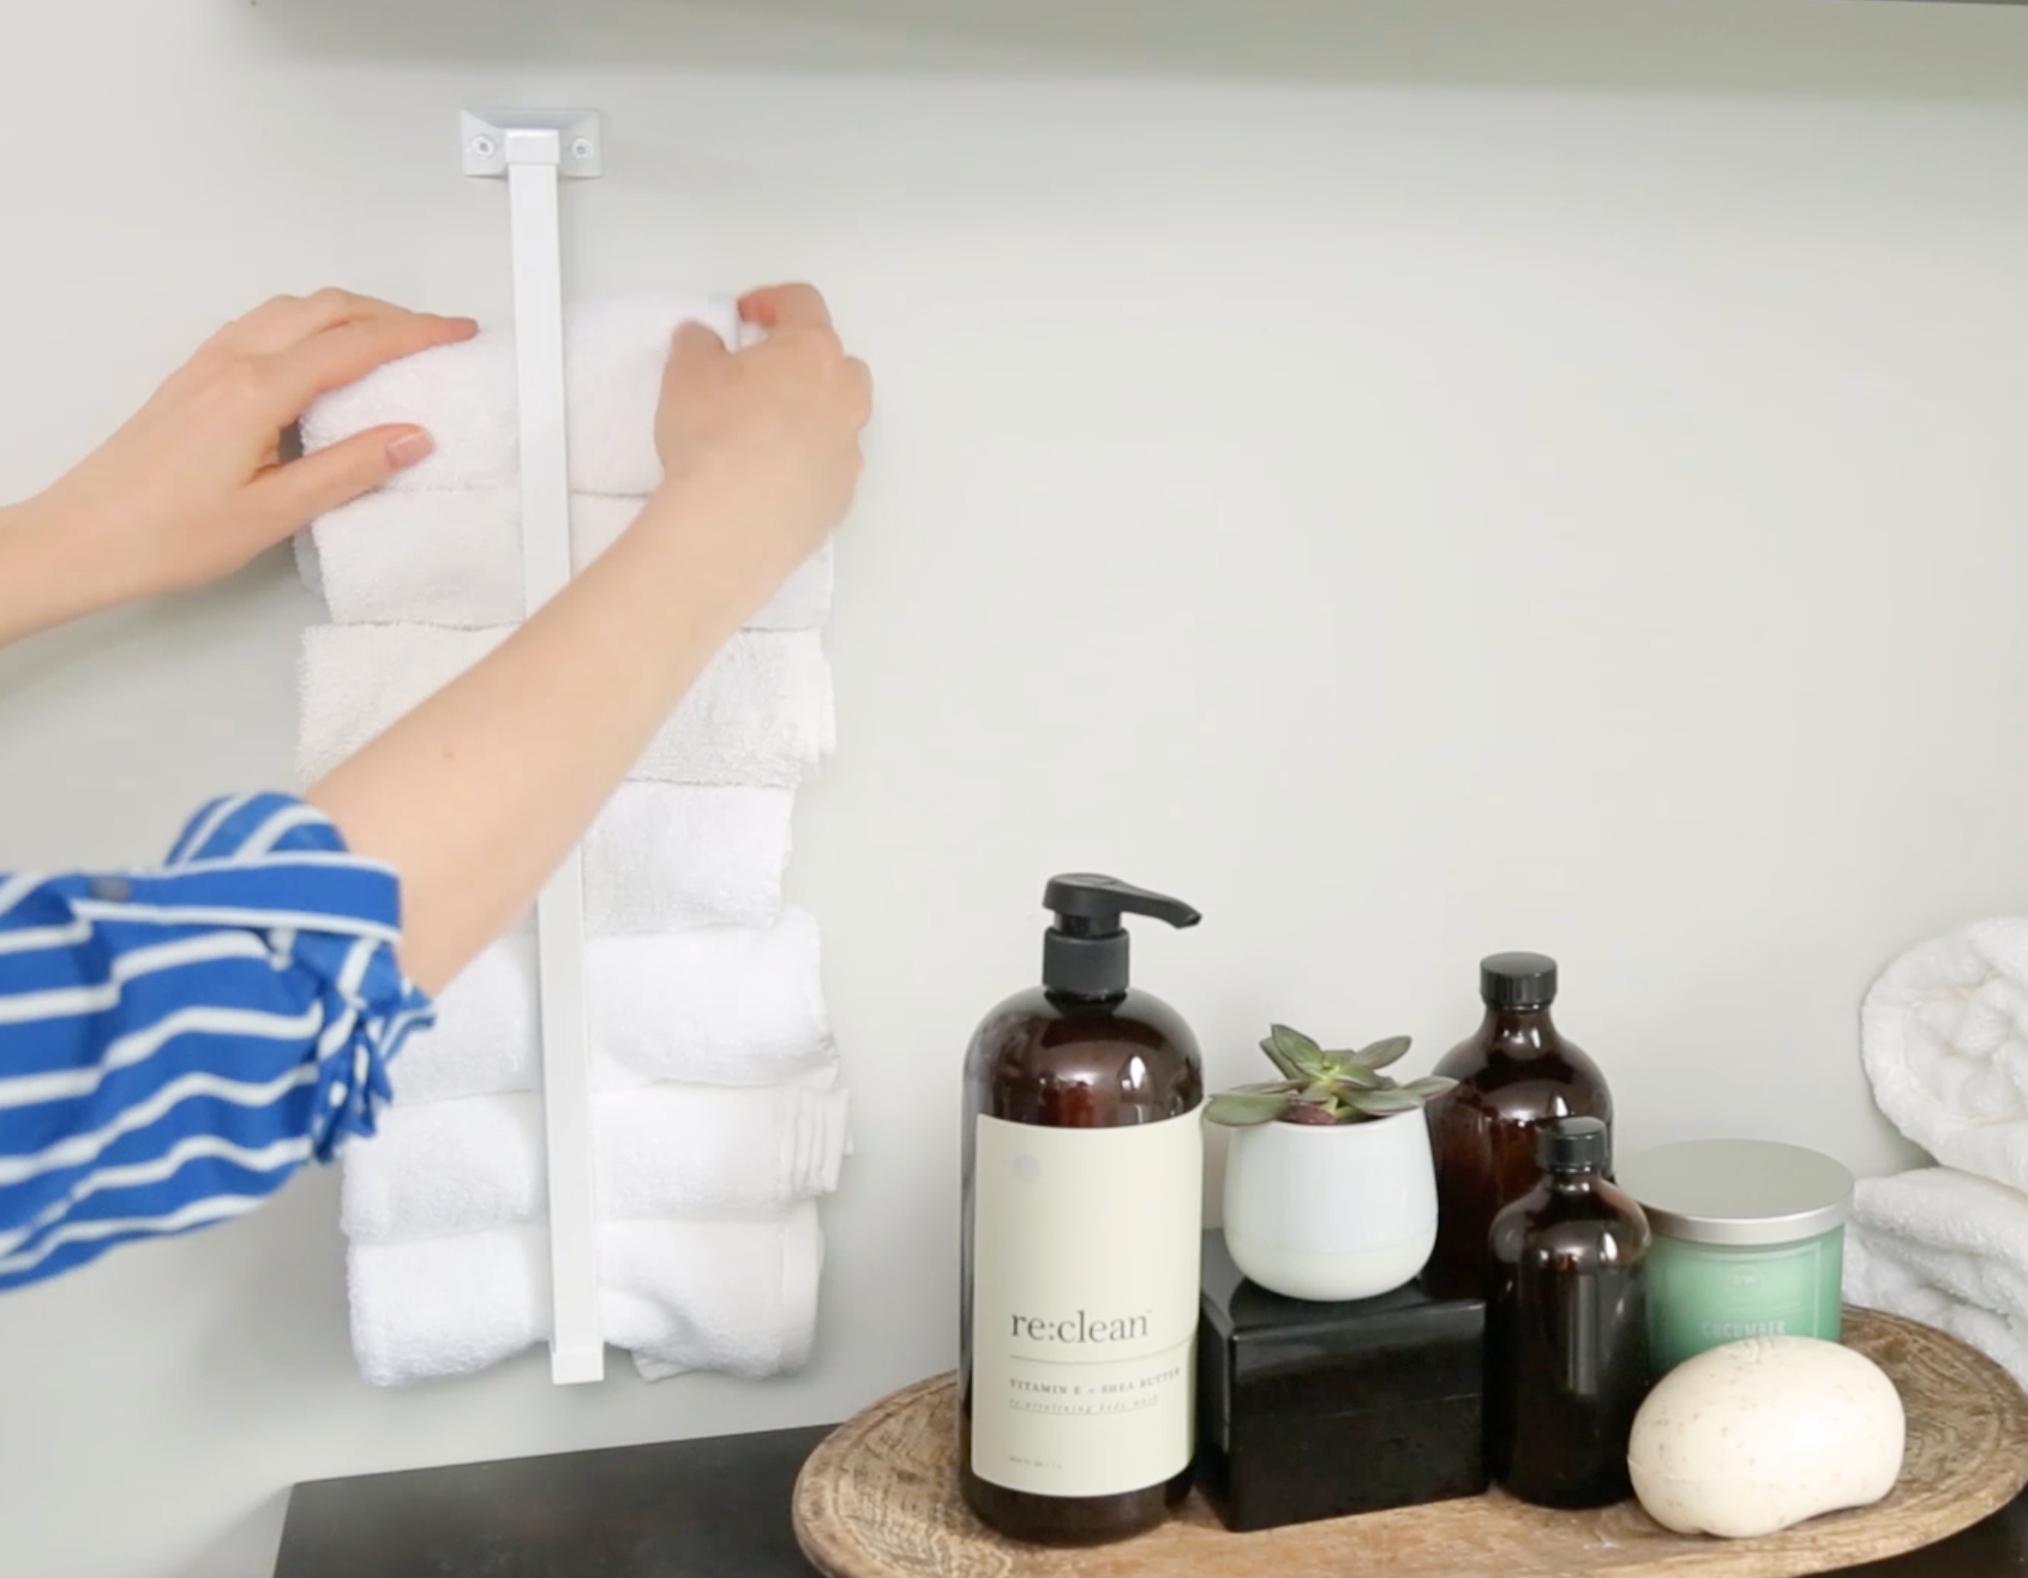 Neat Freak Diy Hand Towel Holder Bathroom Storage Solutions Clever Storage Solutions Neat Freak